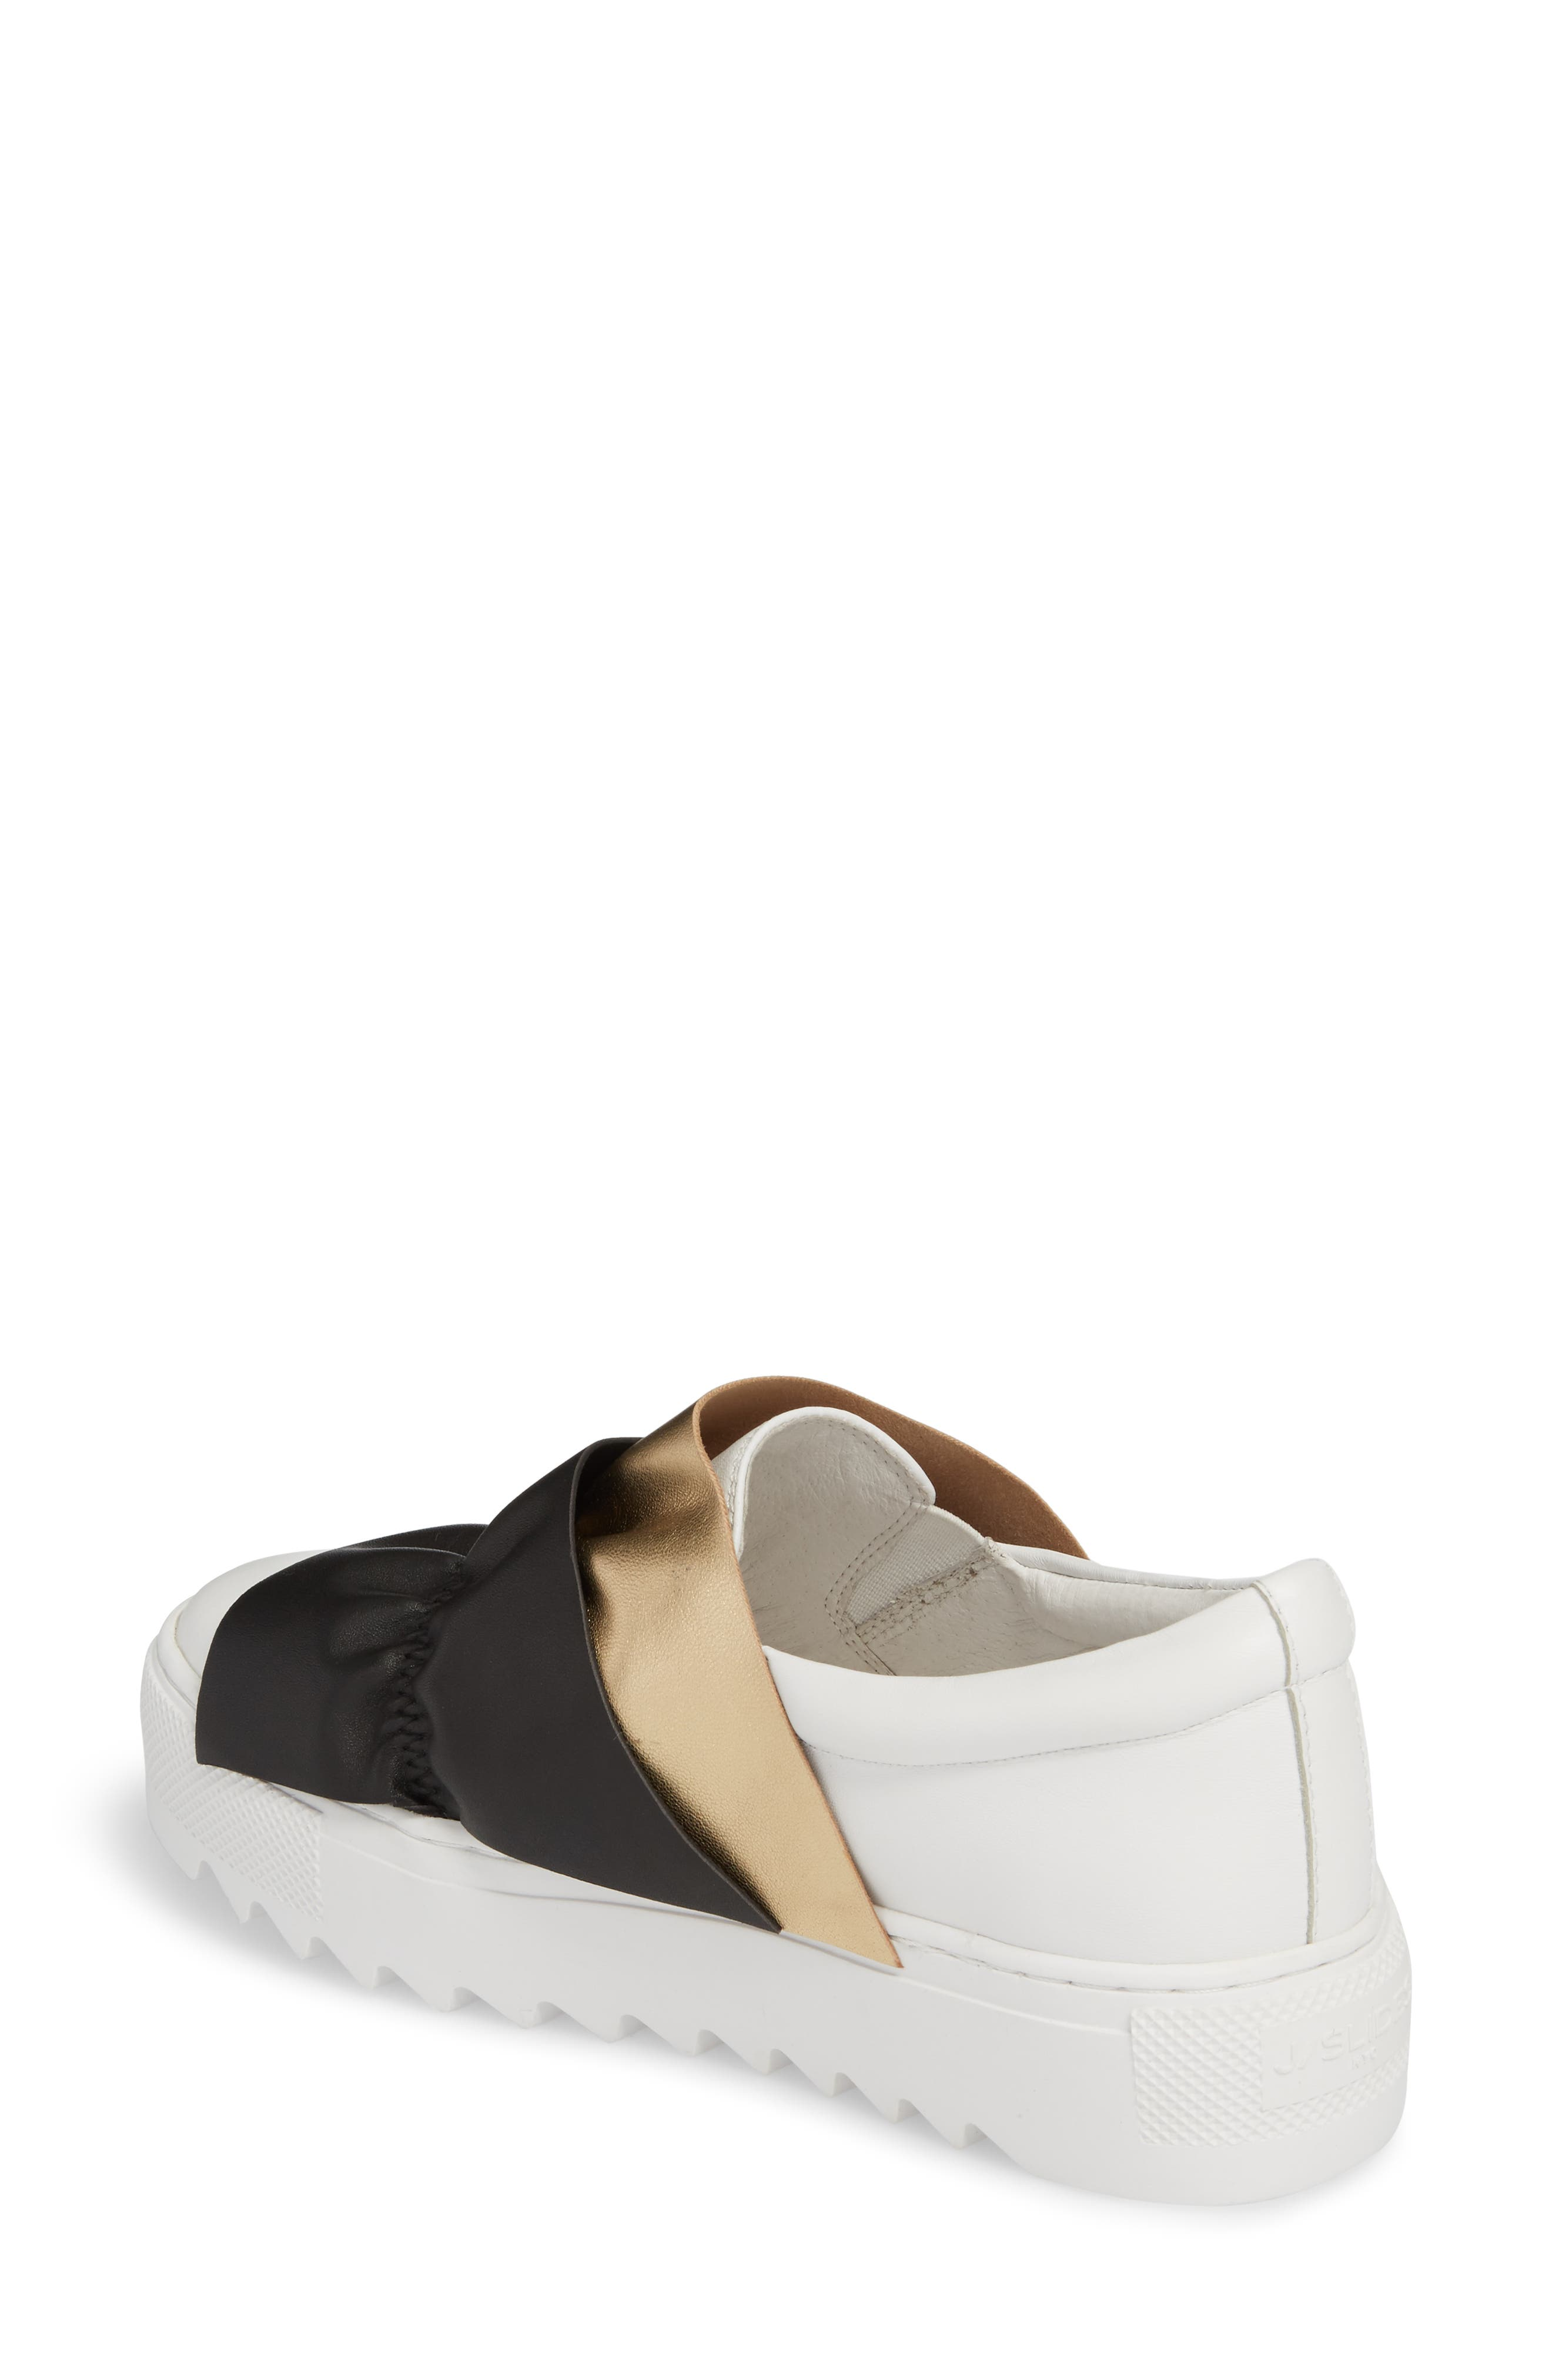 Sadie Ruffle Platform Sneaker,                             Alternate thumbnail 2, color,                             White Leather